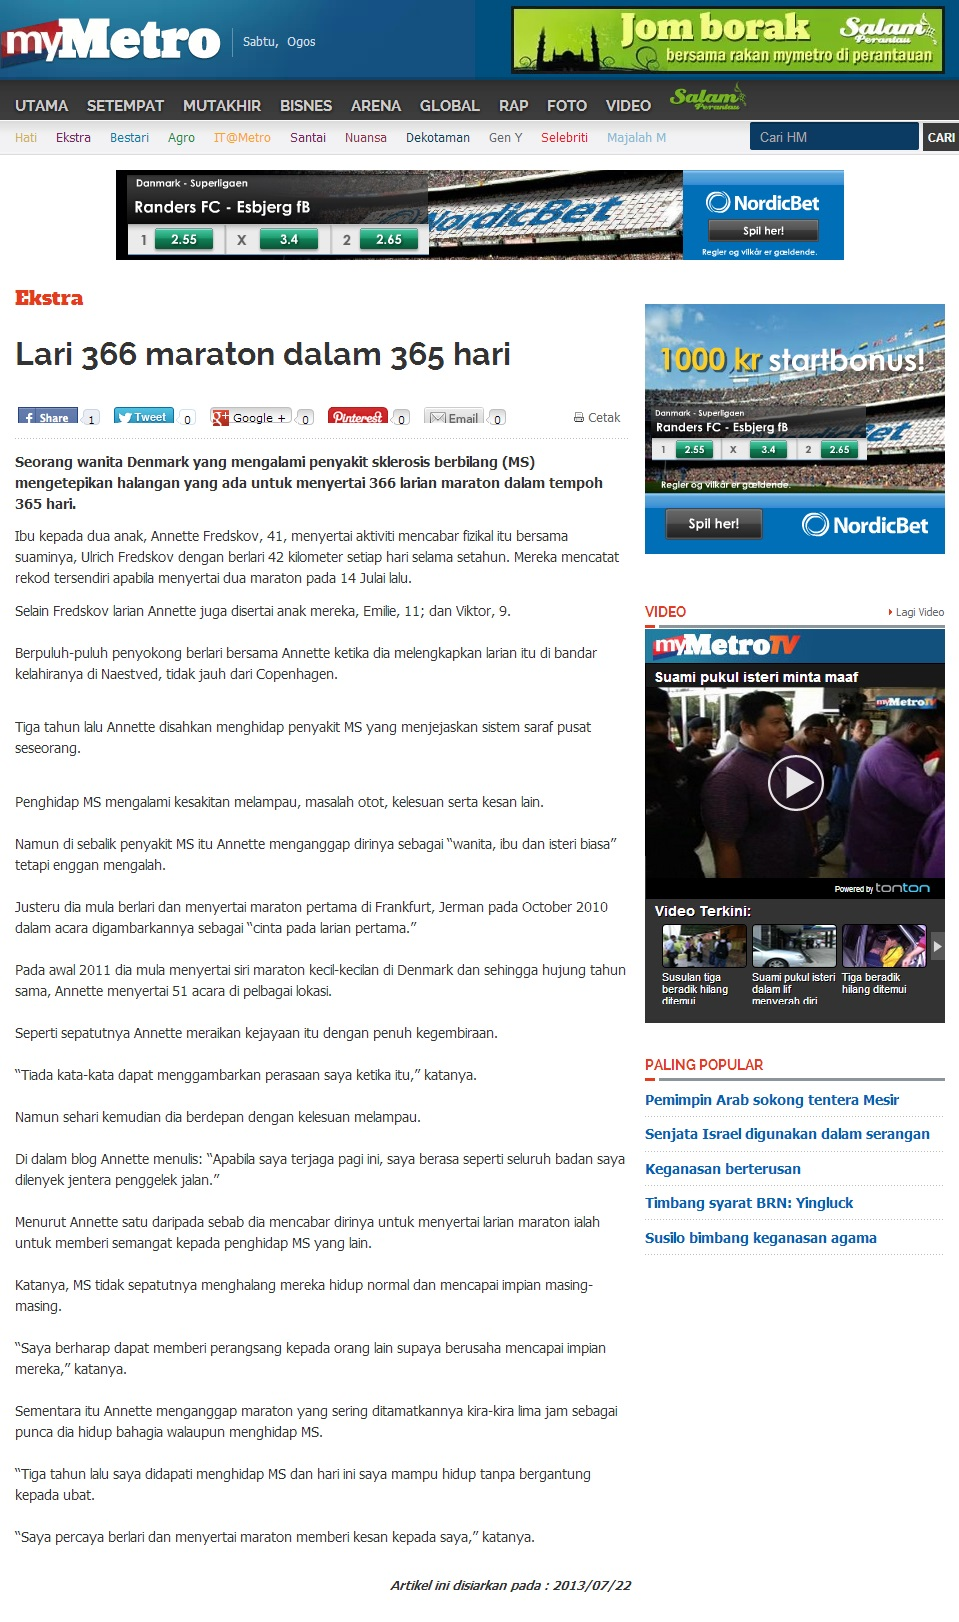 hmetro.com.my 2013.07.22 malaysisk